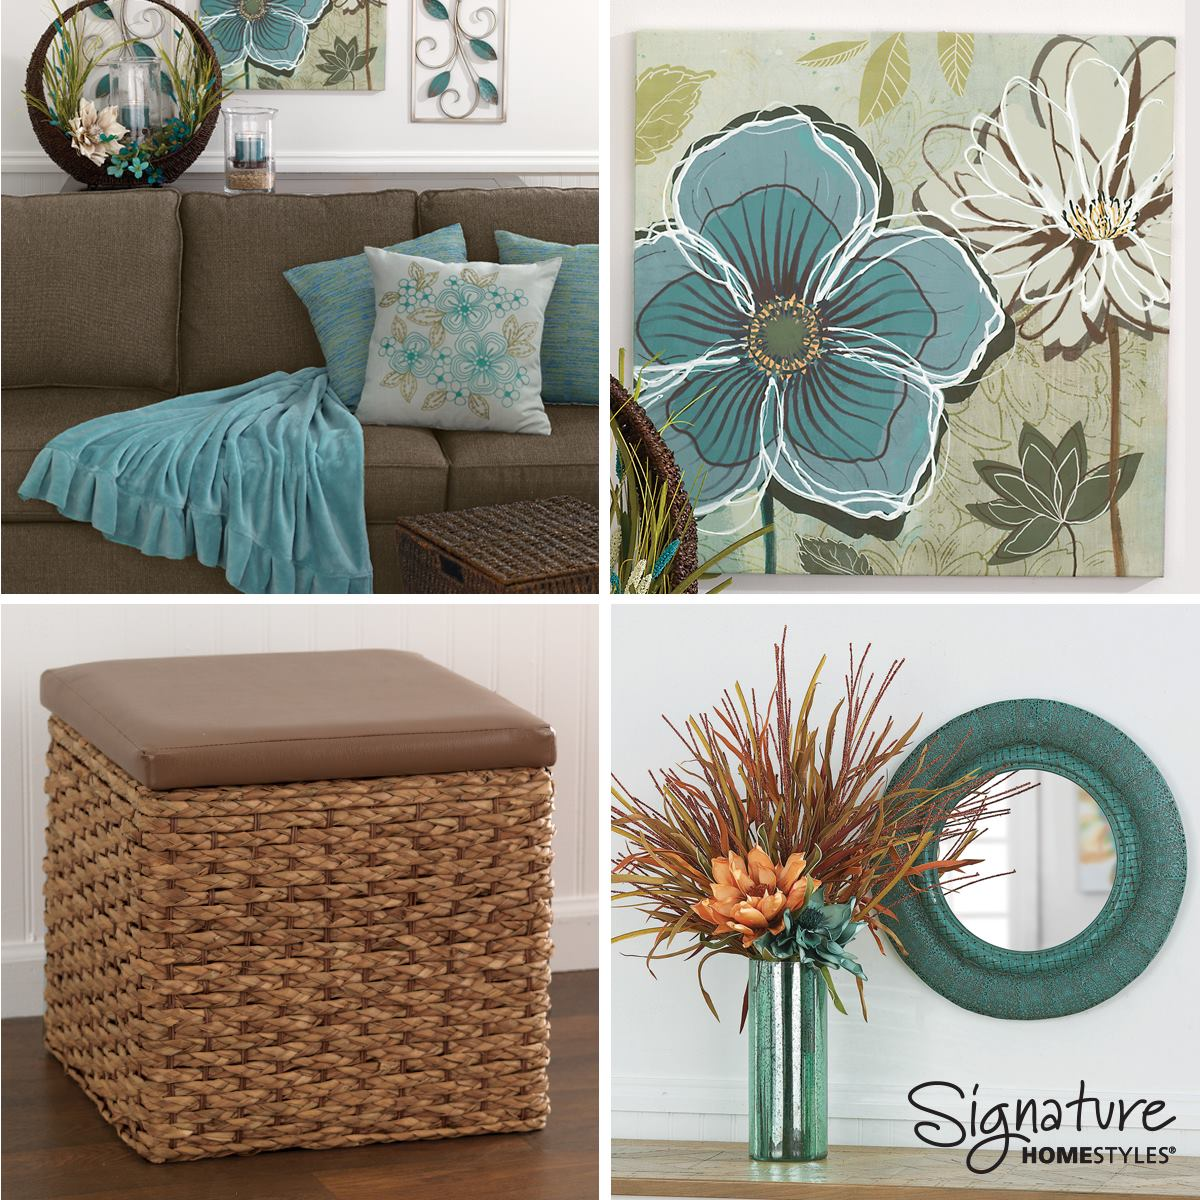 Signature Homestyles Inc (1)